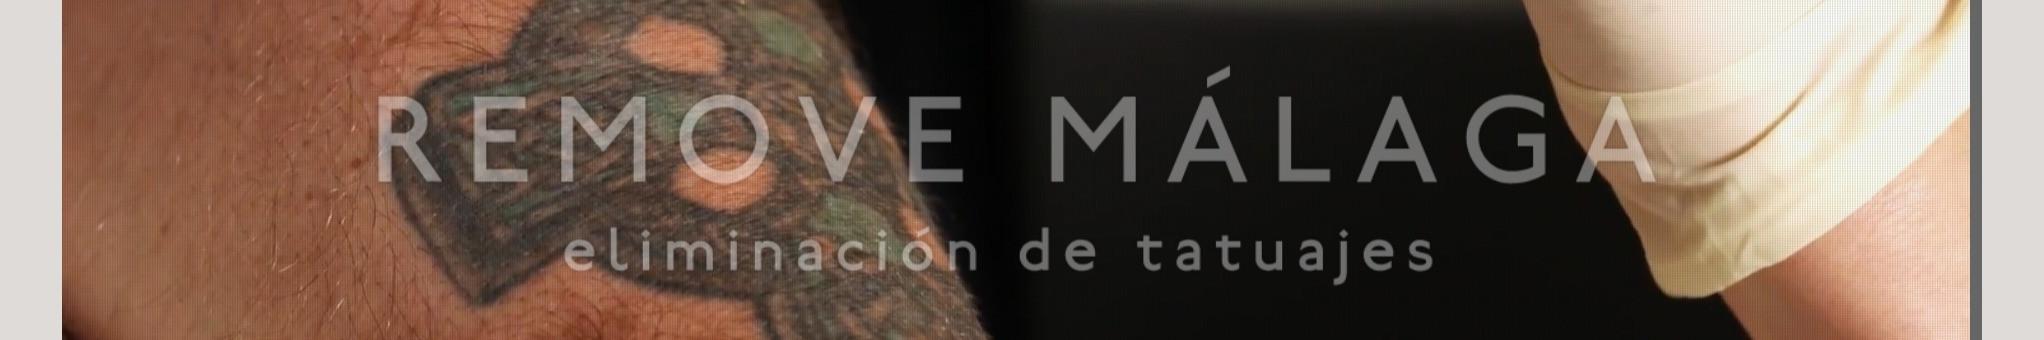 Eliminación Tatuajes Málaga - Borrar Tatuajes